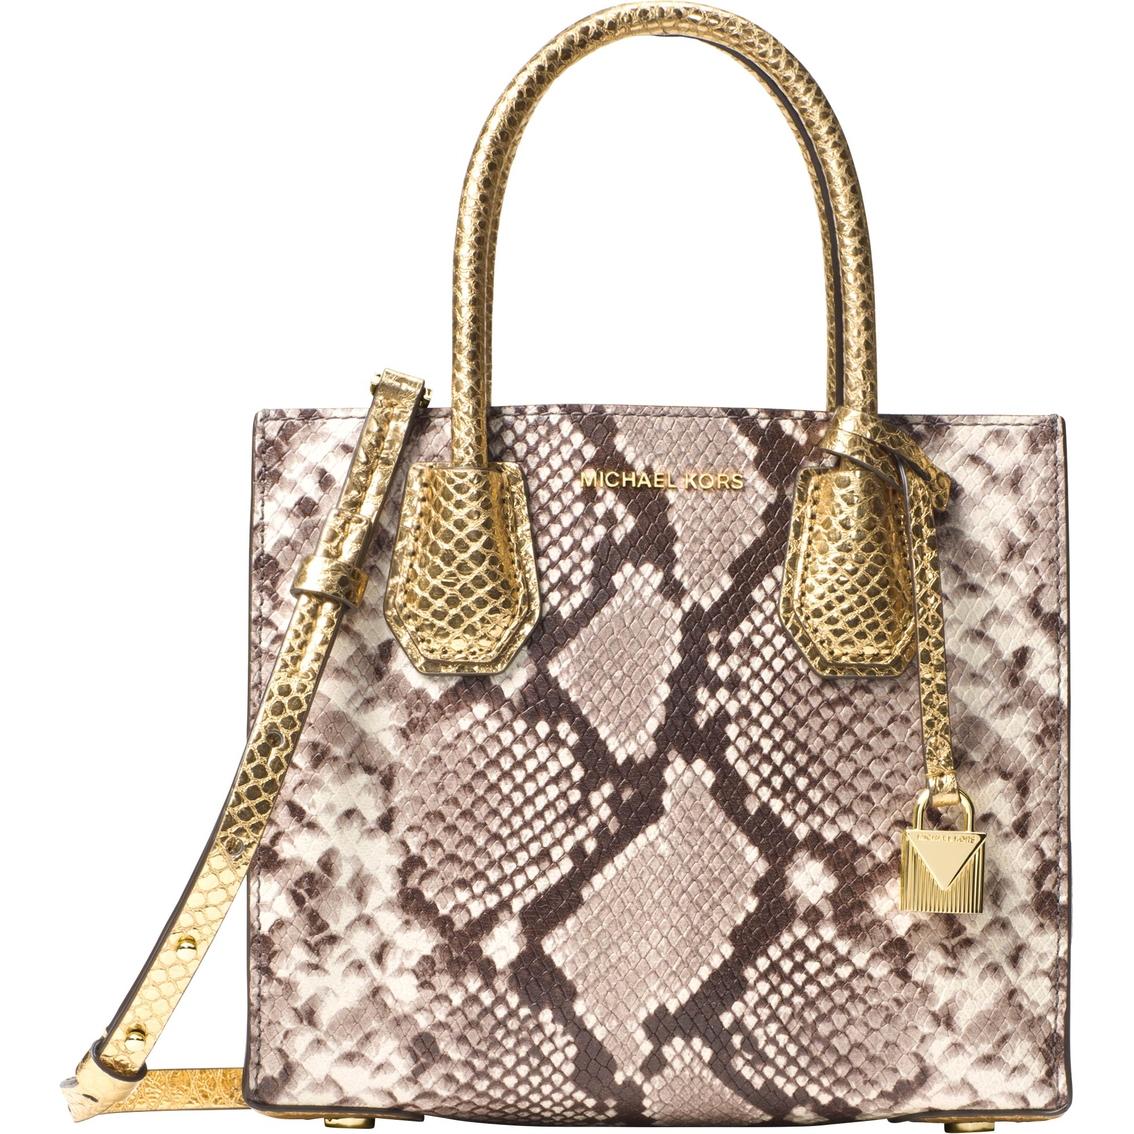 a005e9bd909a Michael Kors Mercer Medium Messenger Bag | Handbags | Shop The Exchange